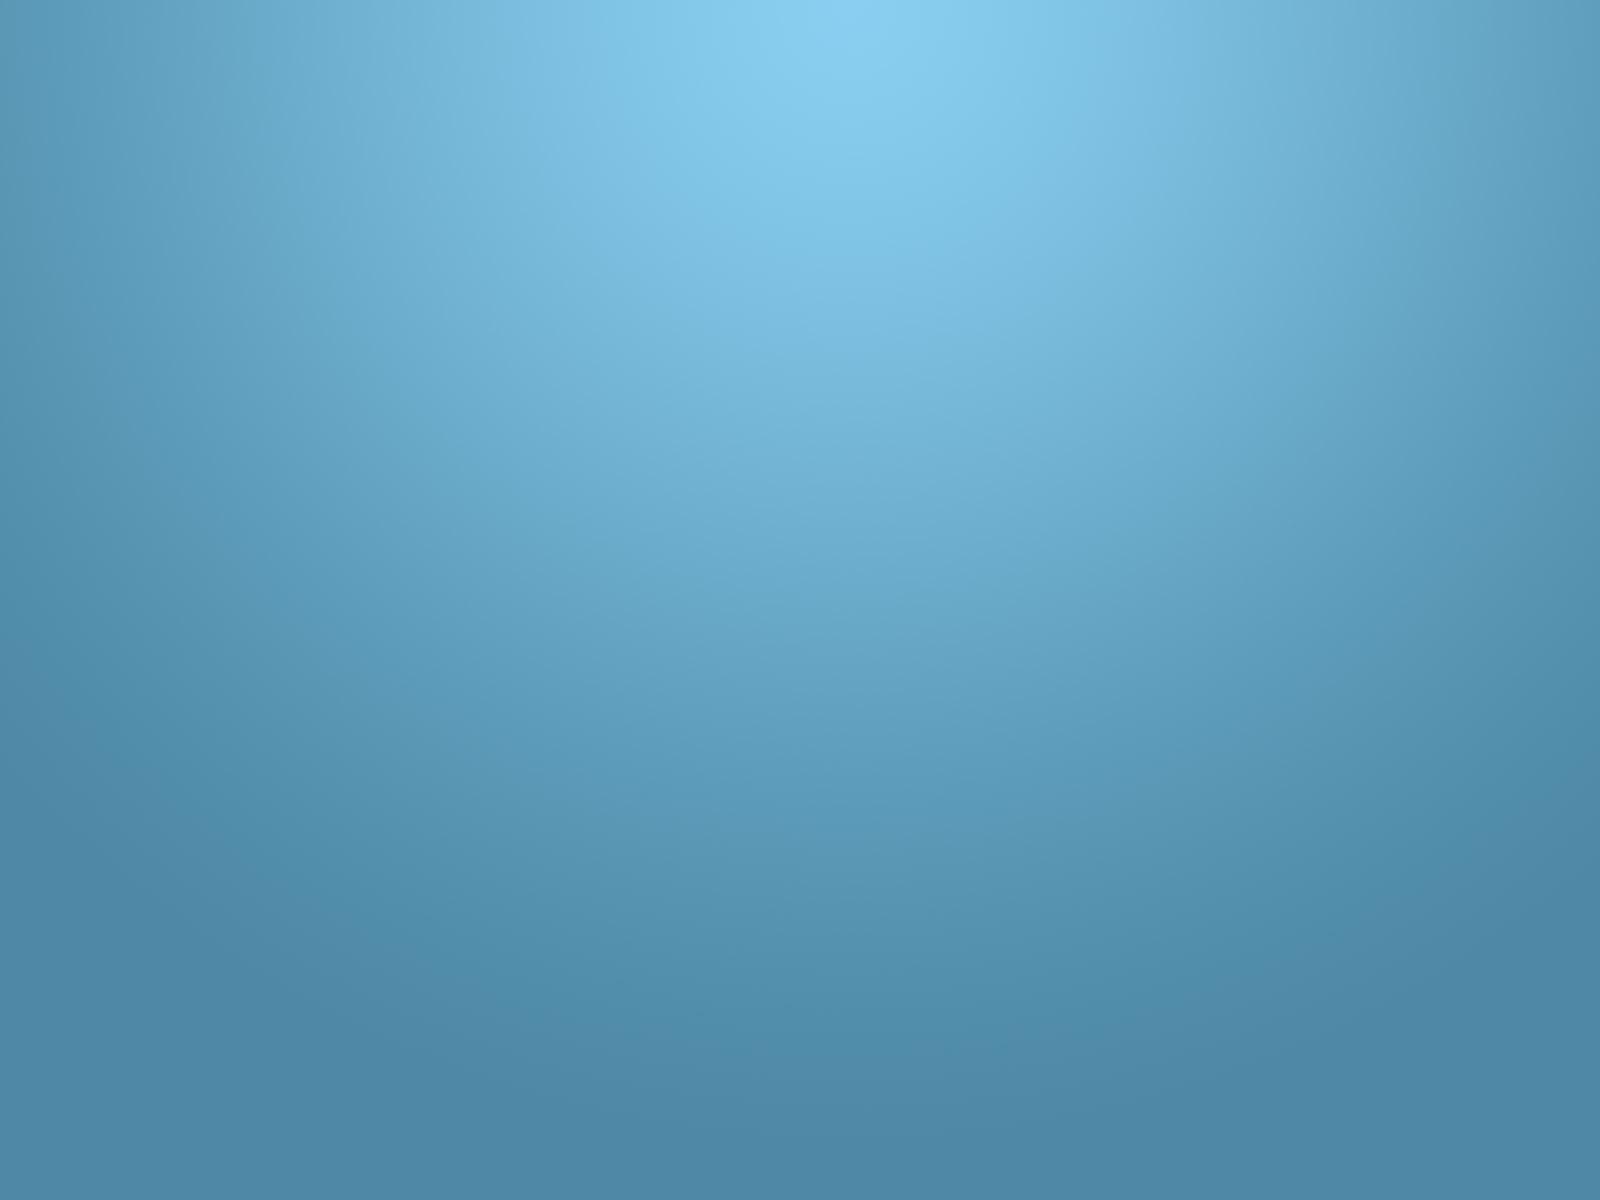 Baby Blue Windows 7 Desktop Wallpaper Baby Blue Wallpapers 1600x1200